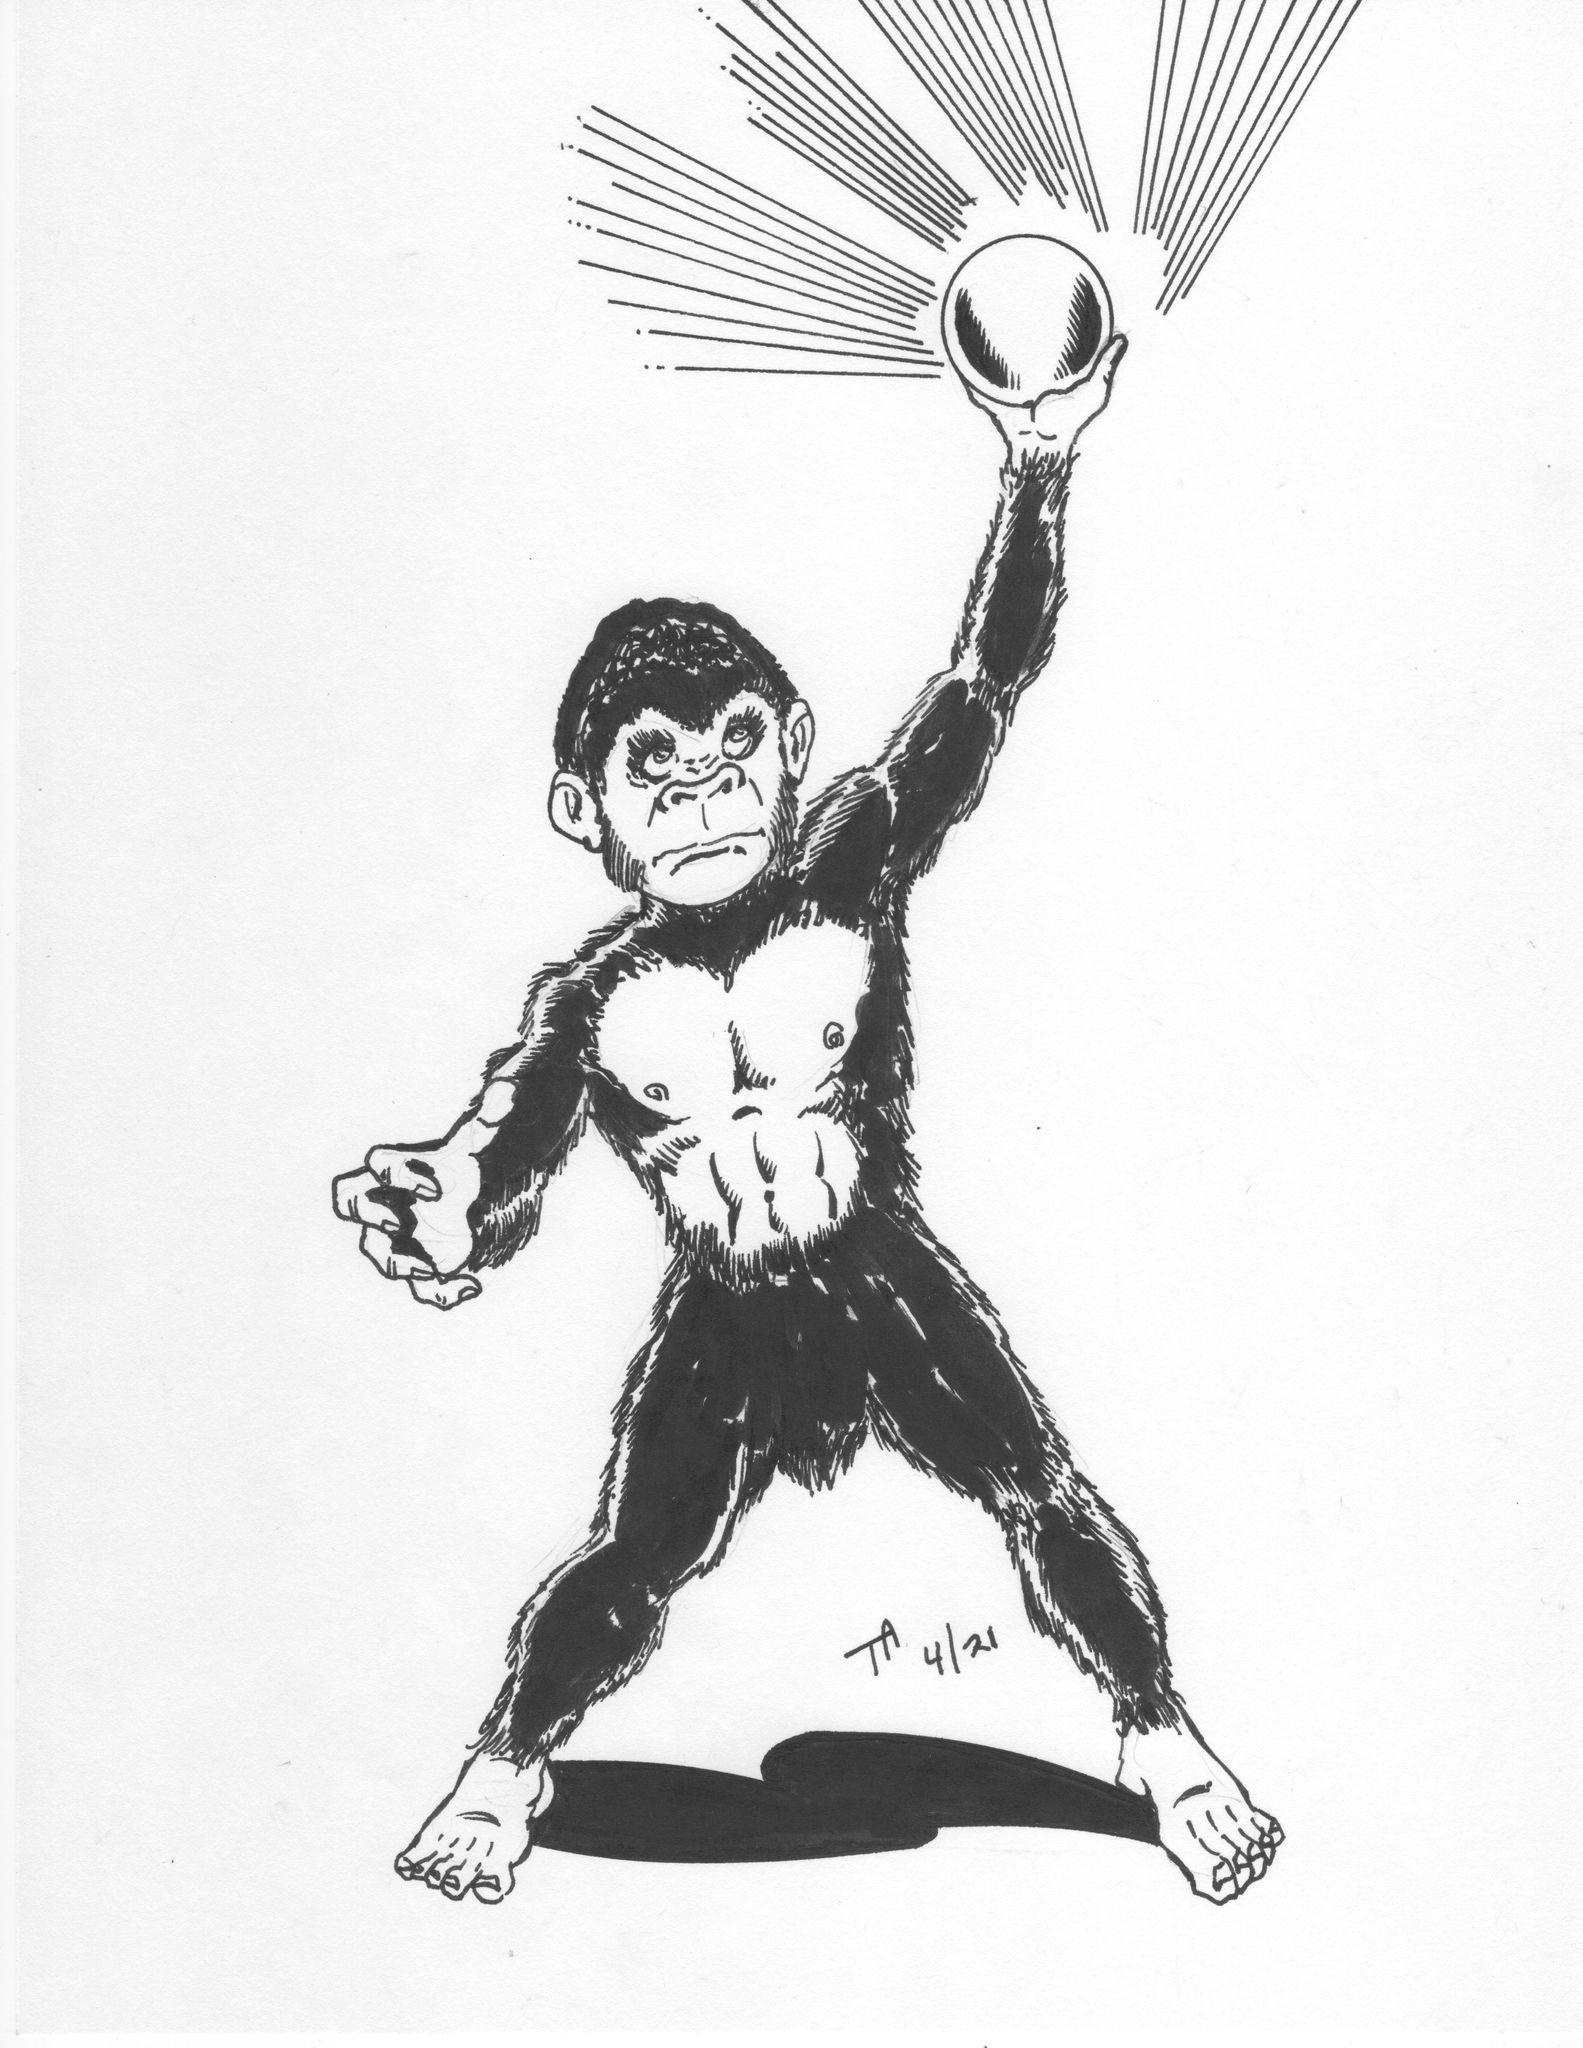 Bukit Timah Monkey Man of Singapore